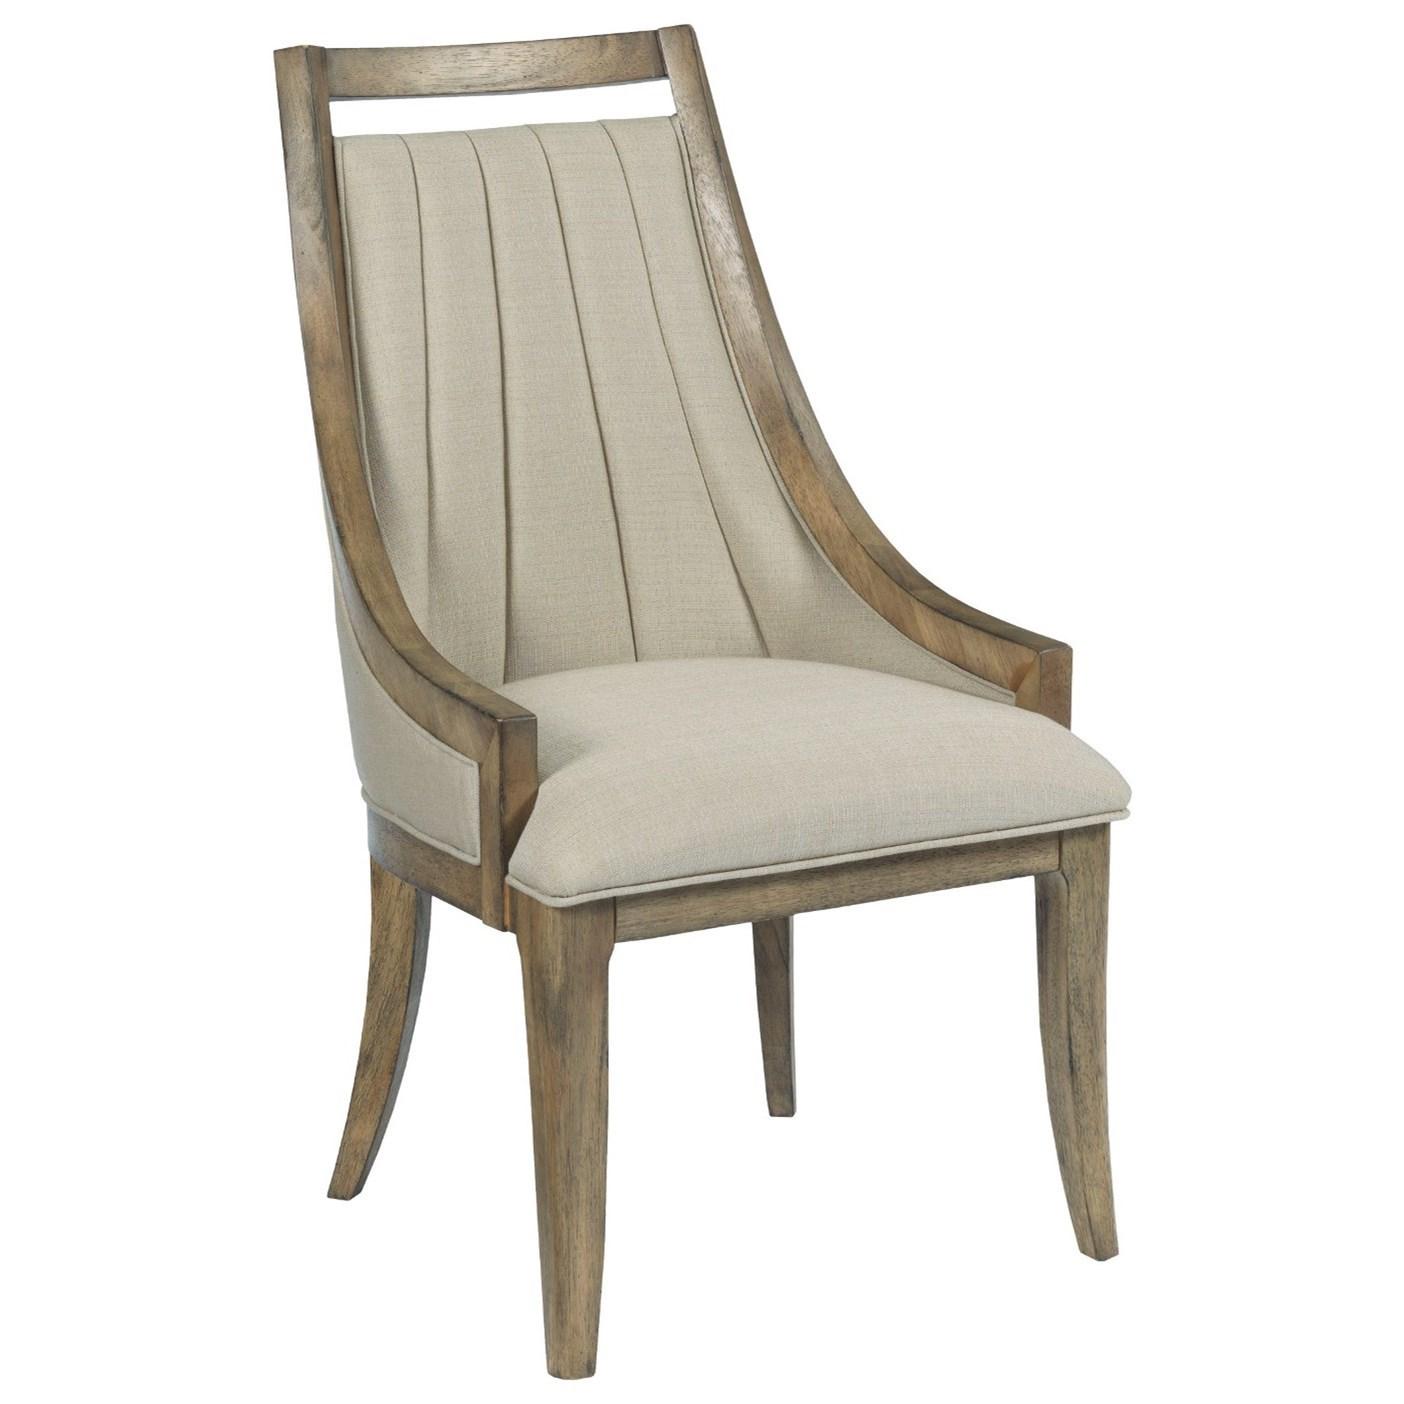 American Drew EVOKE  Upholstered Dining Chair - Item Number: 509-622